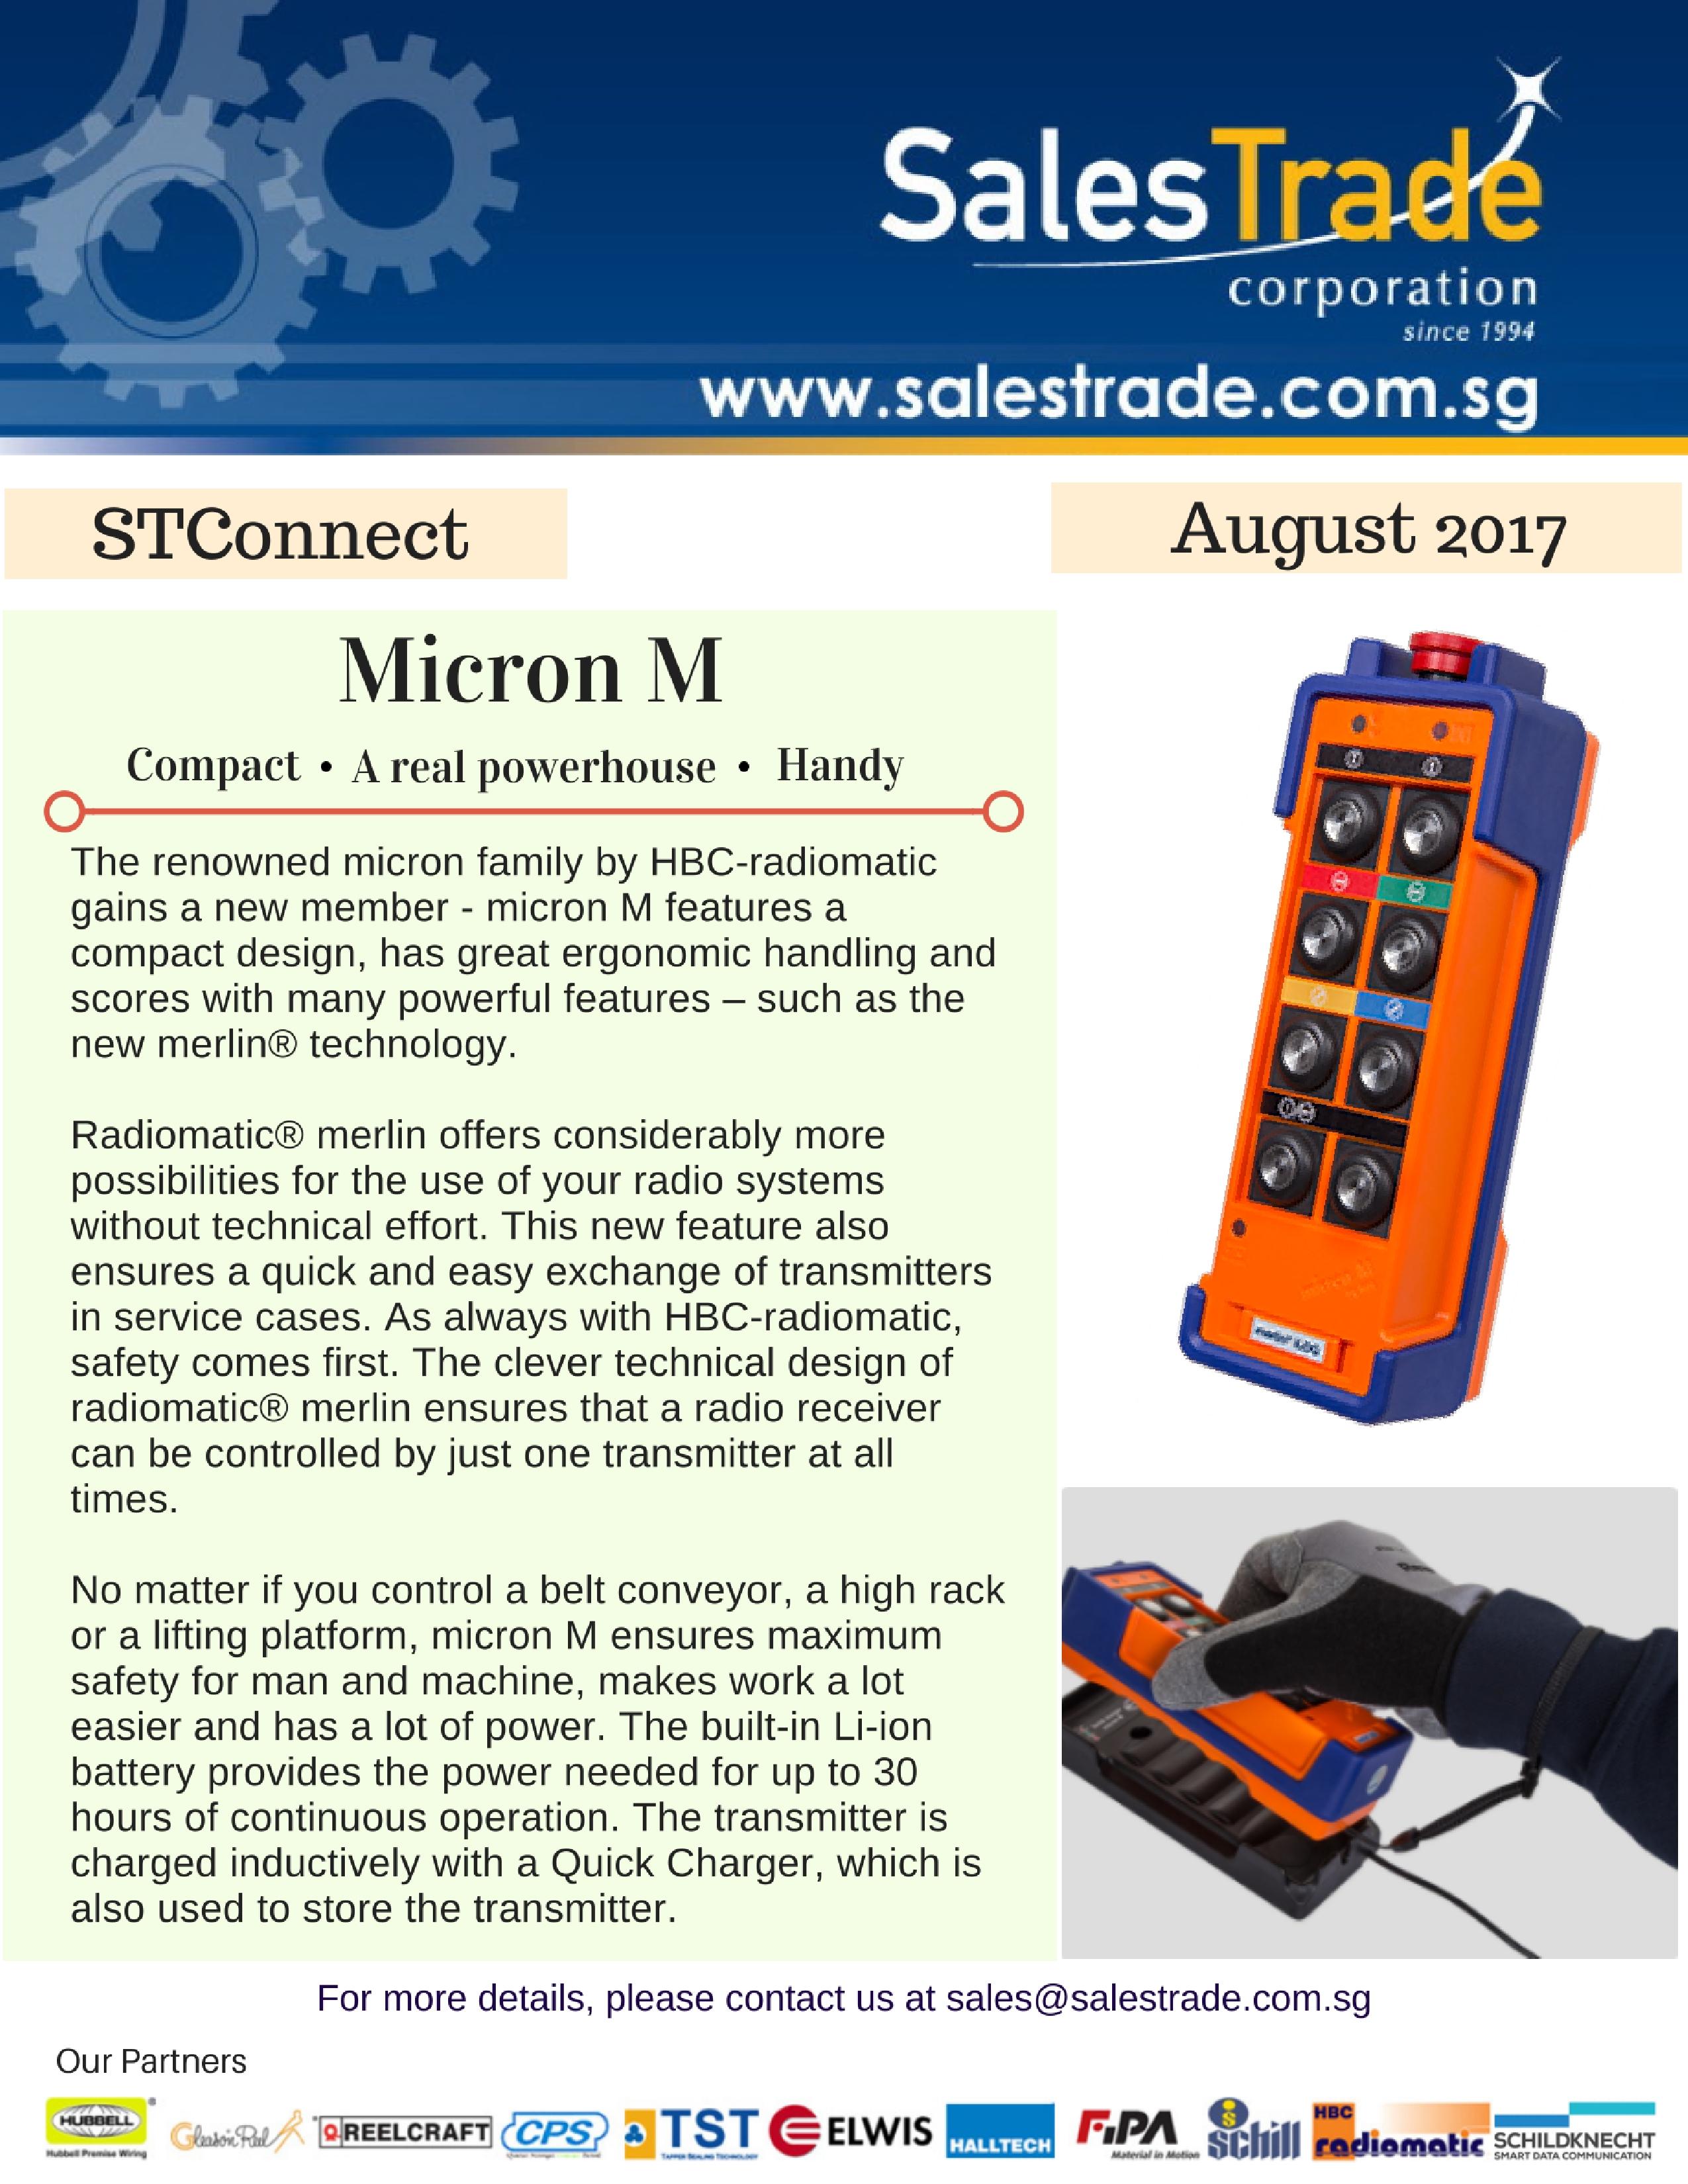 STConnect - August 2017 (JPG)